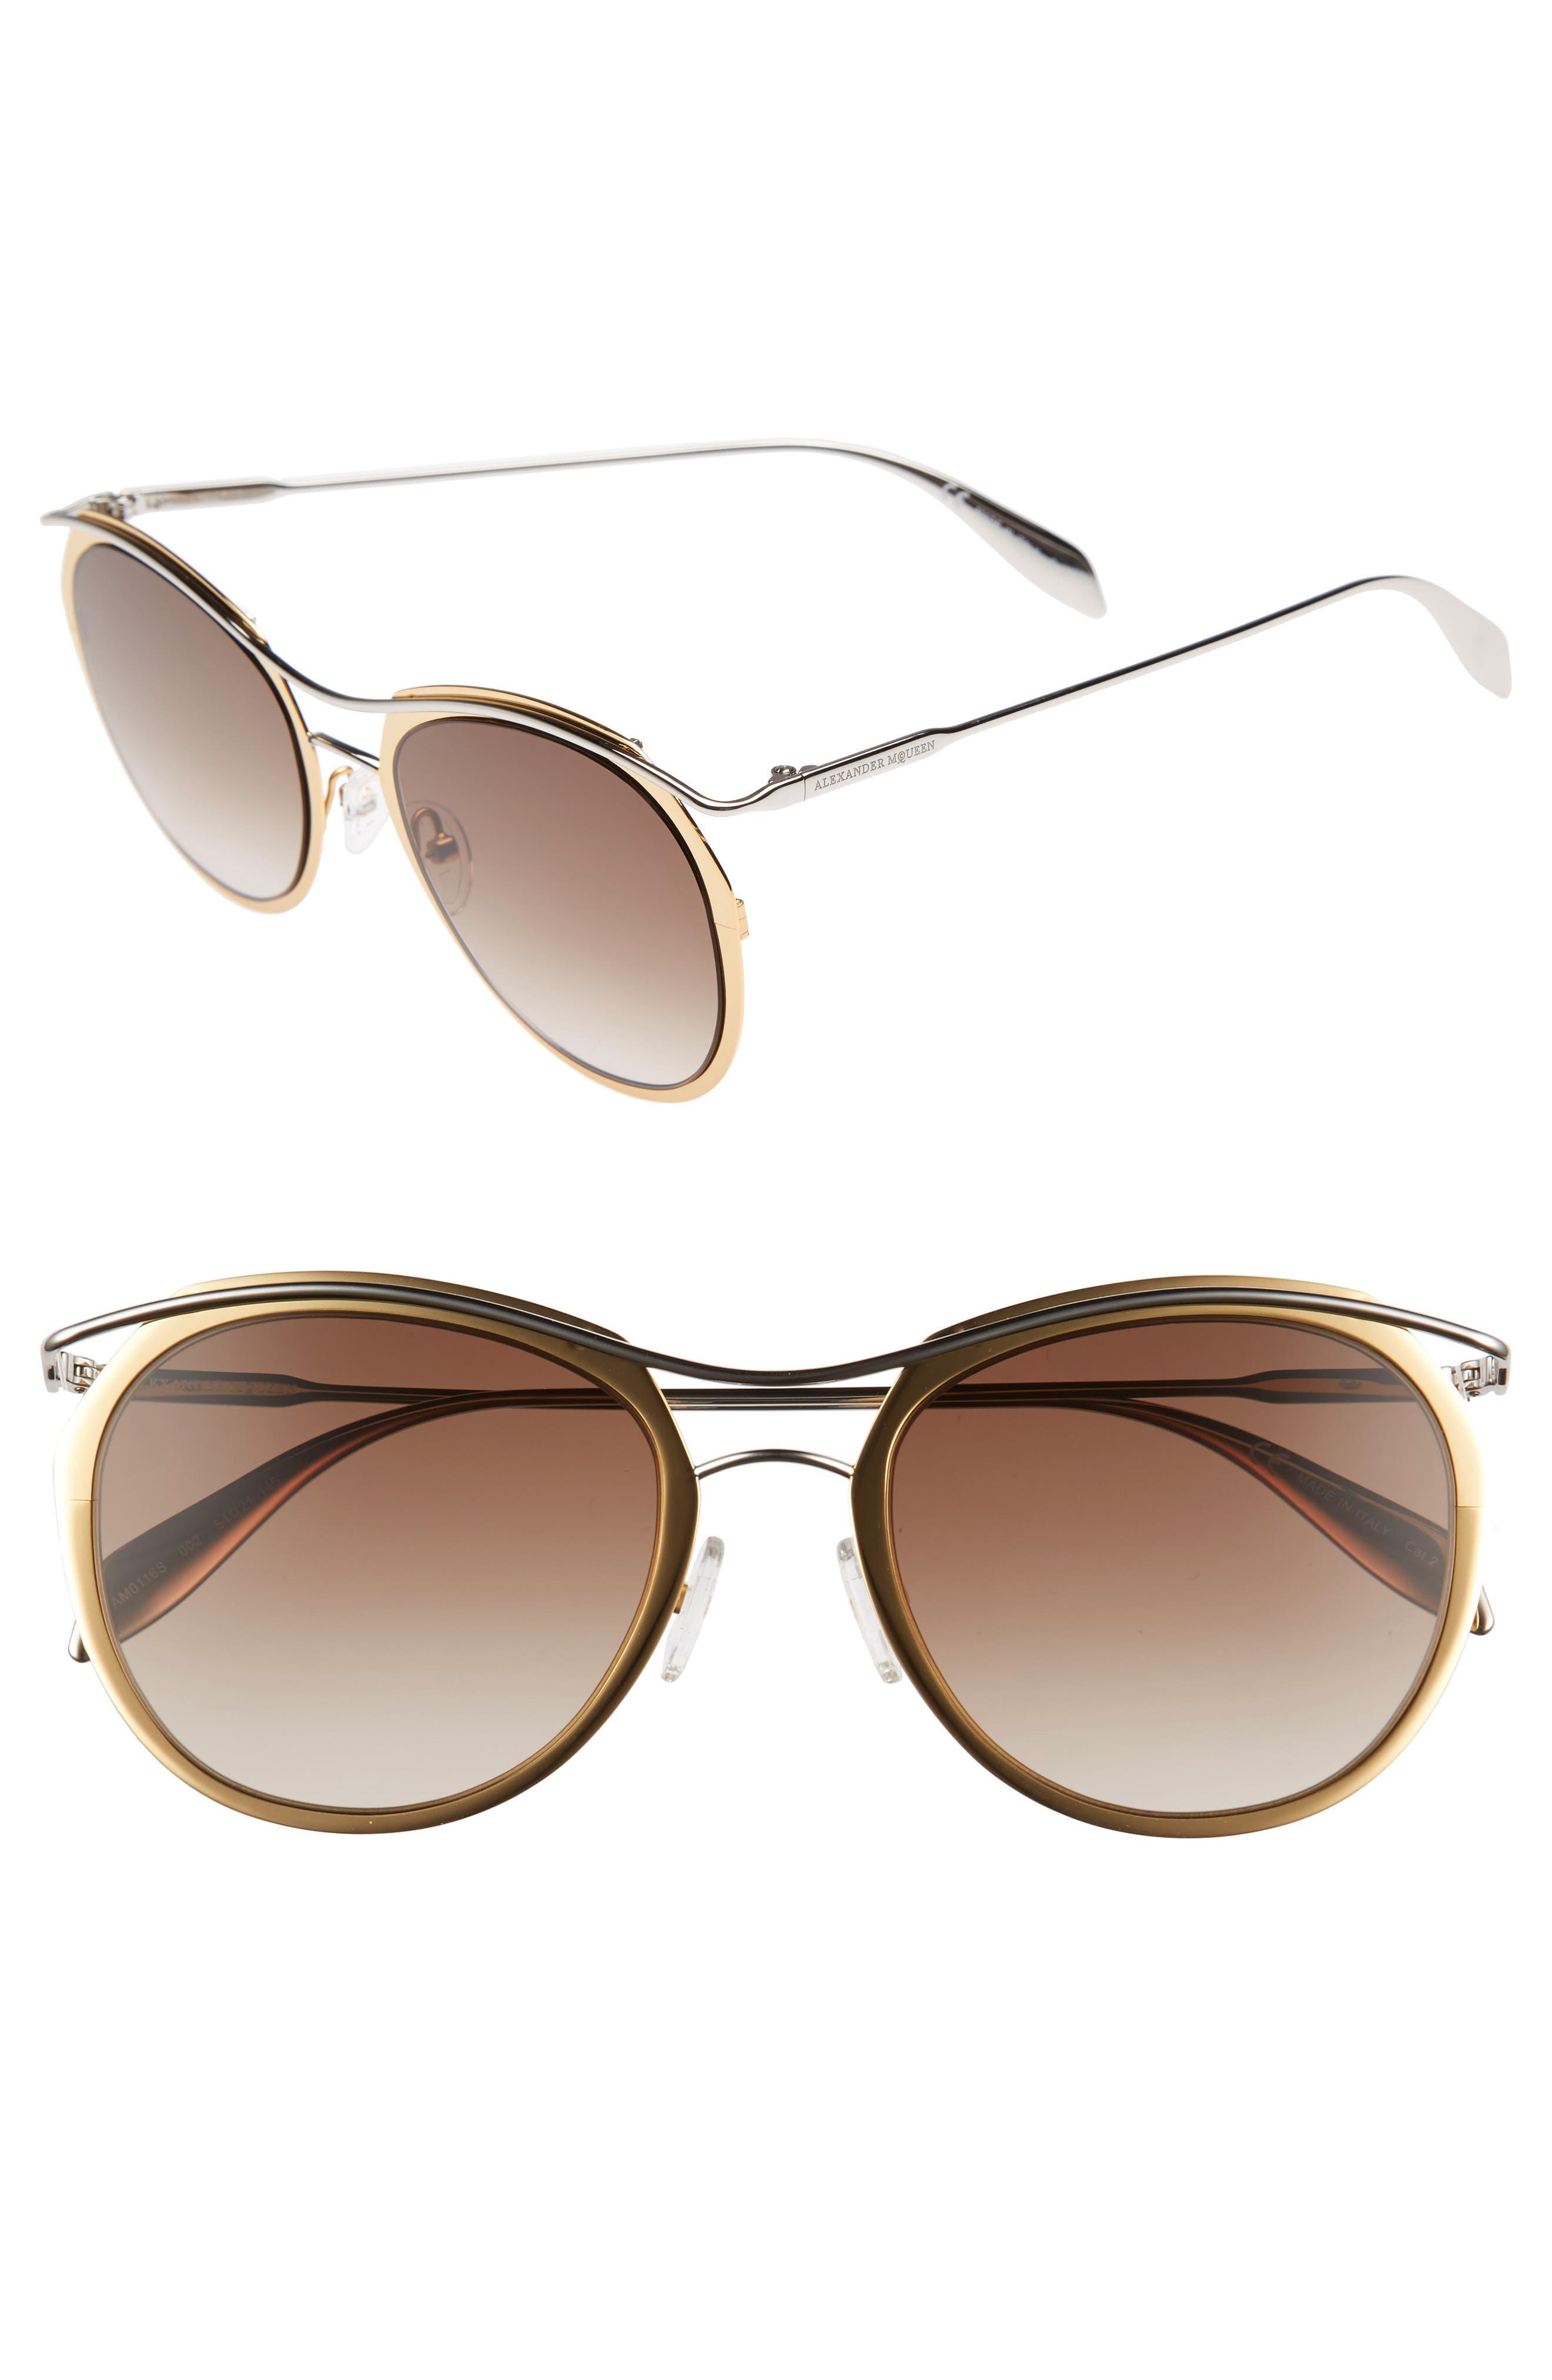 Main Image - Alexander McQueen 54mm Gradient Round Sunglasses